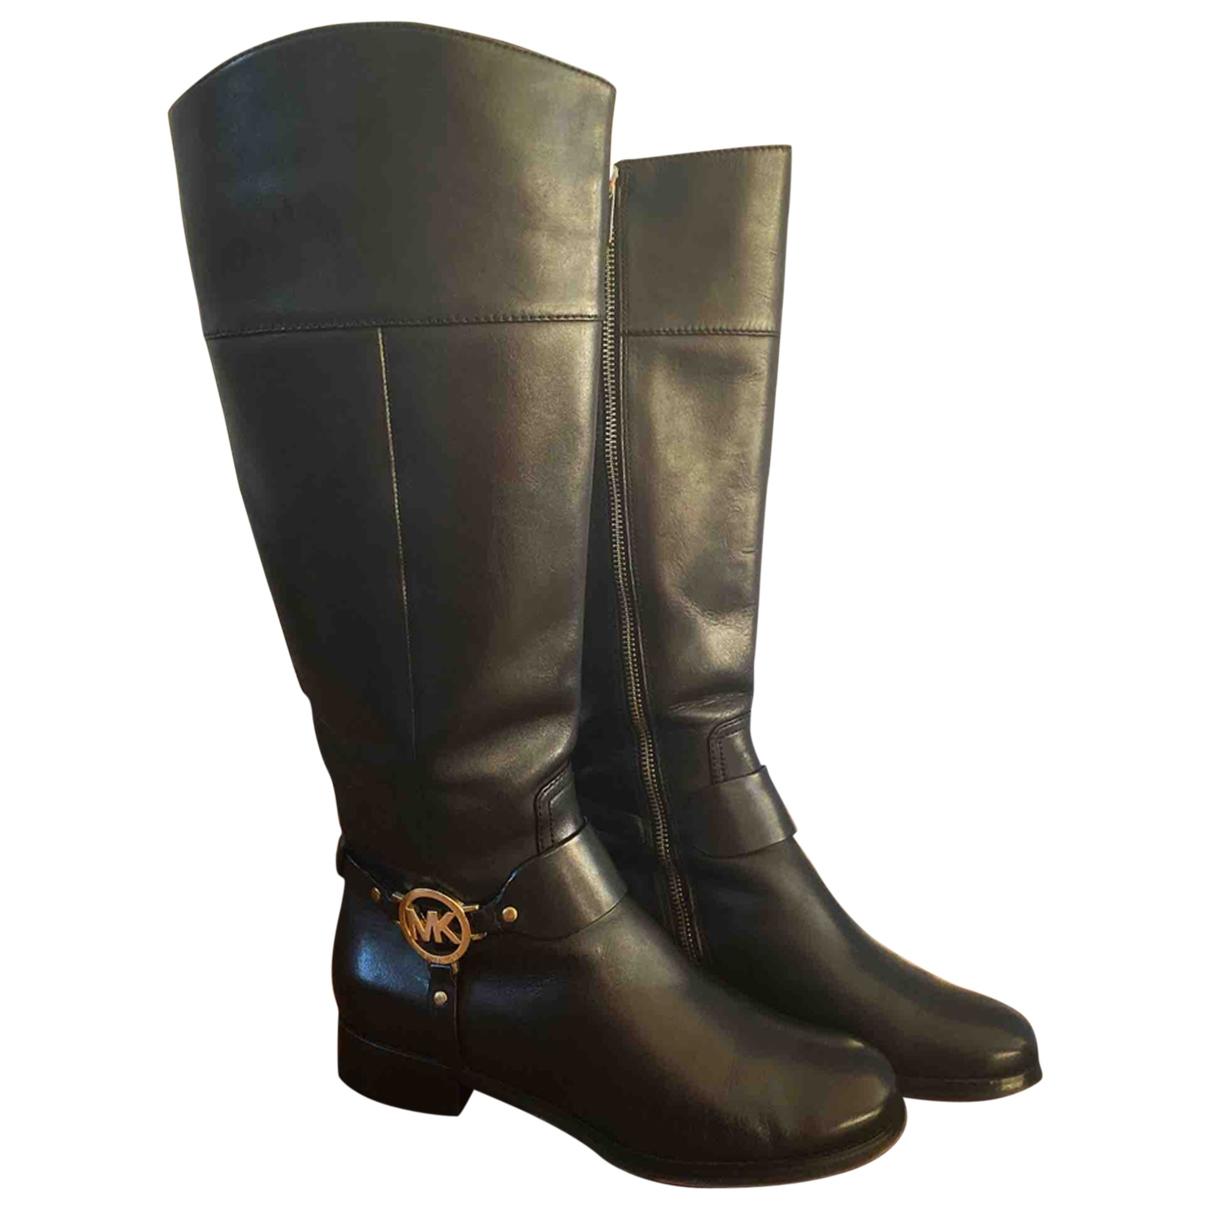 Michael Kors \N Black Leather Boots for Women 37 EU